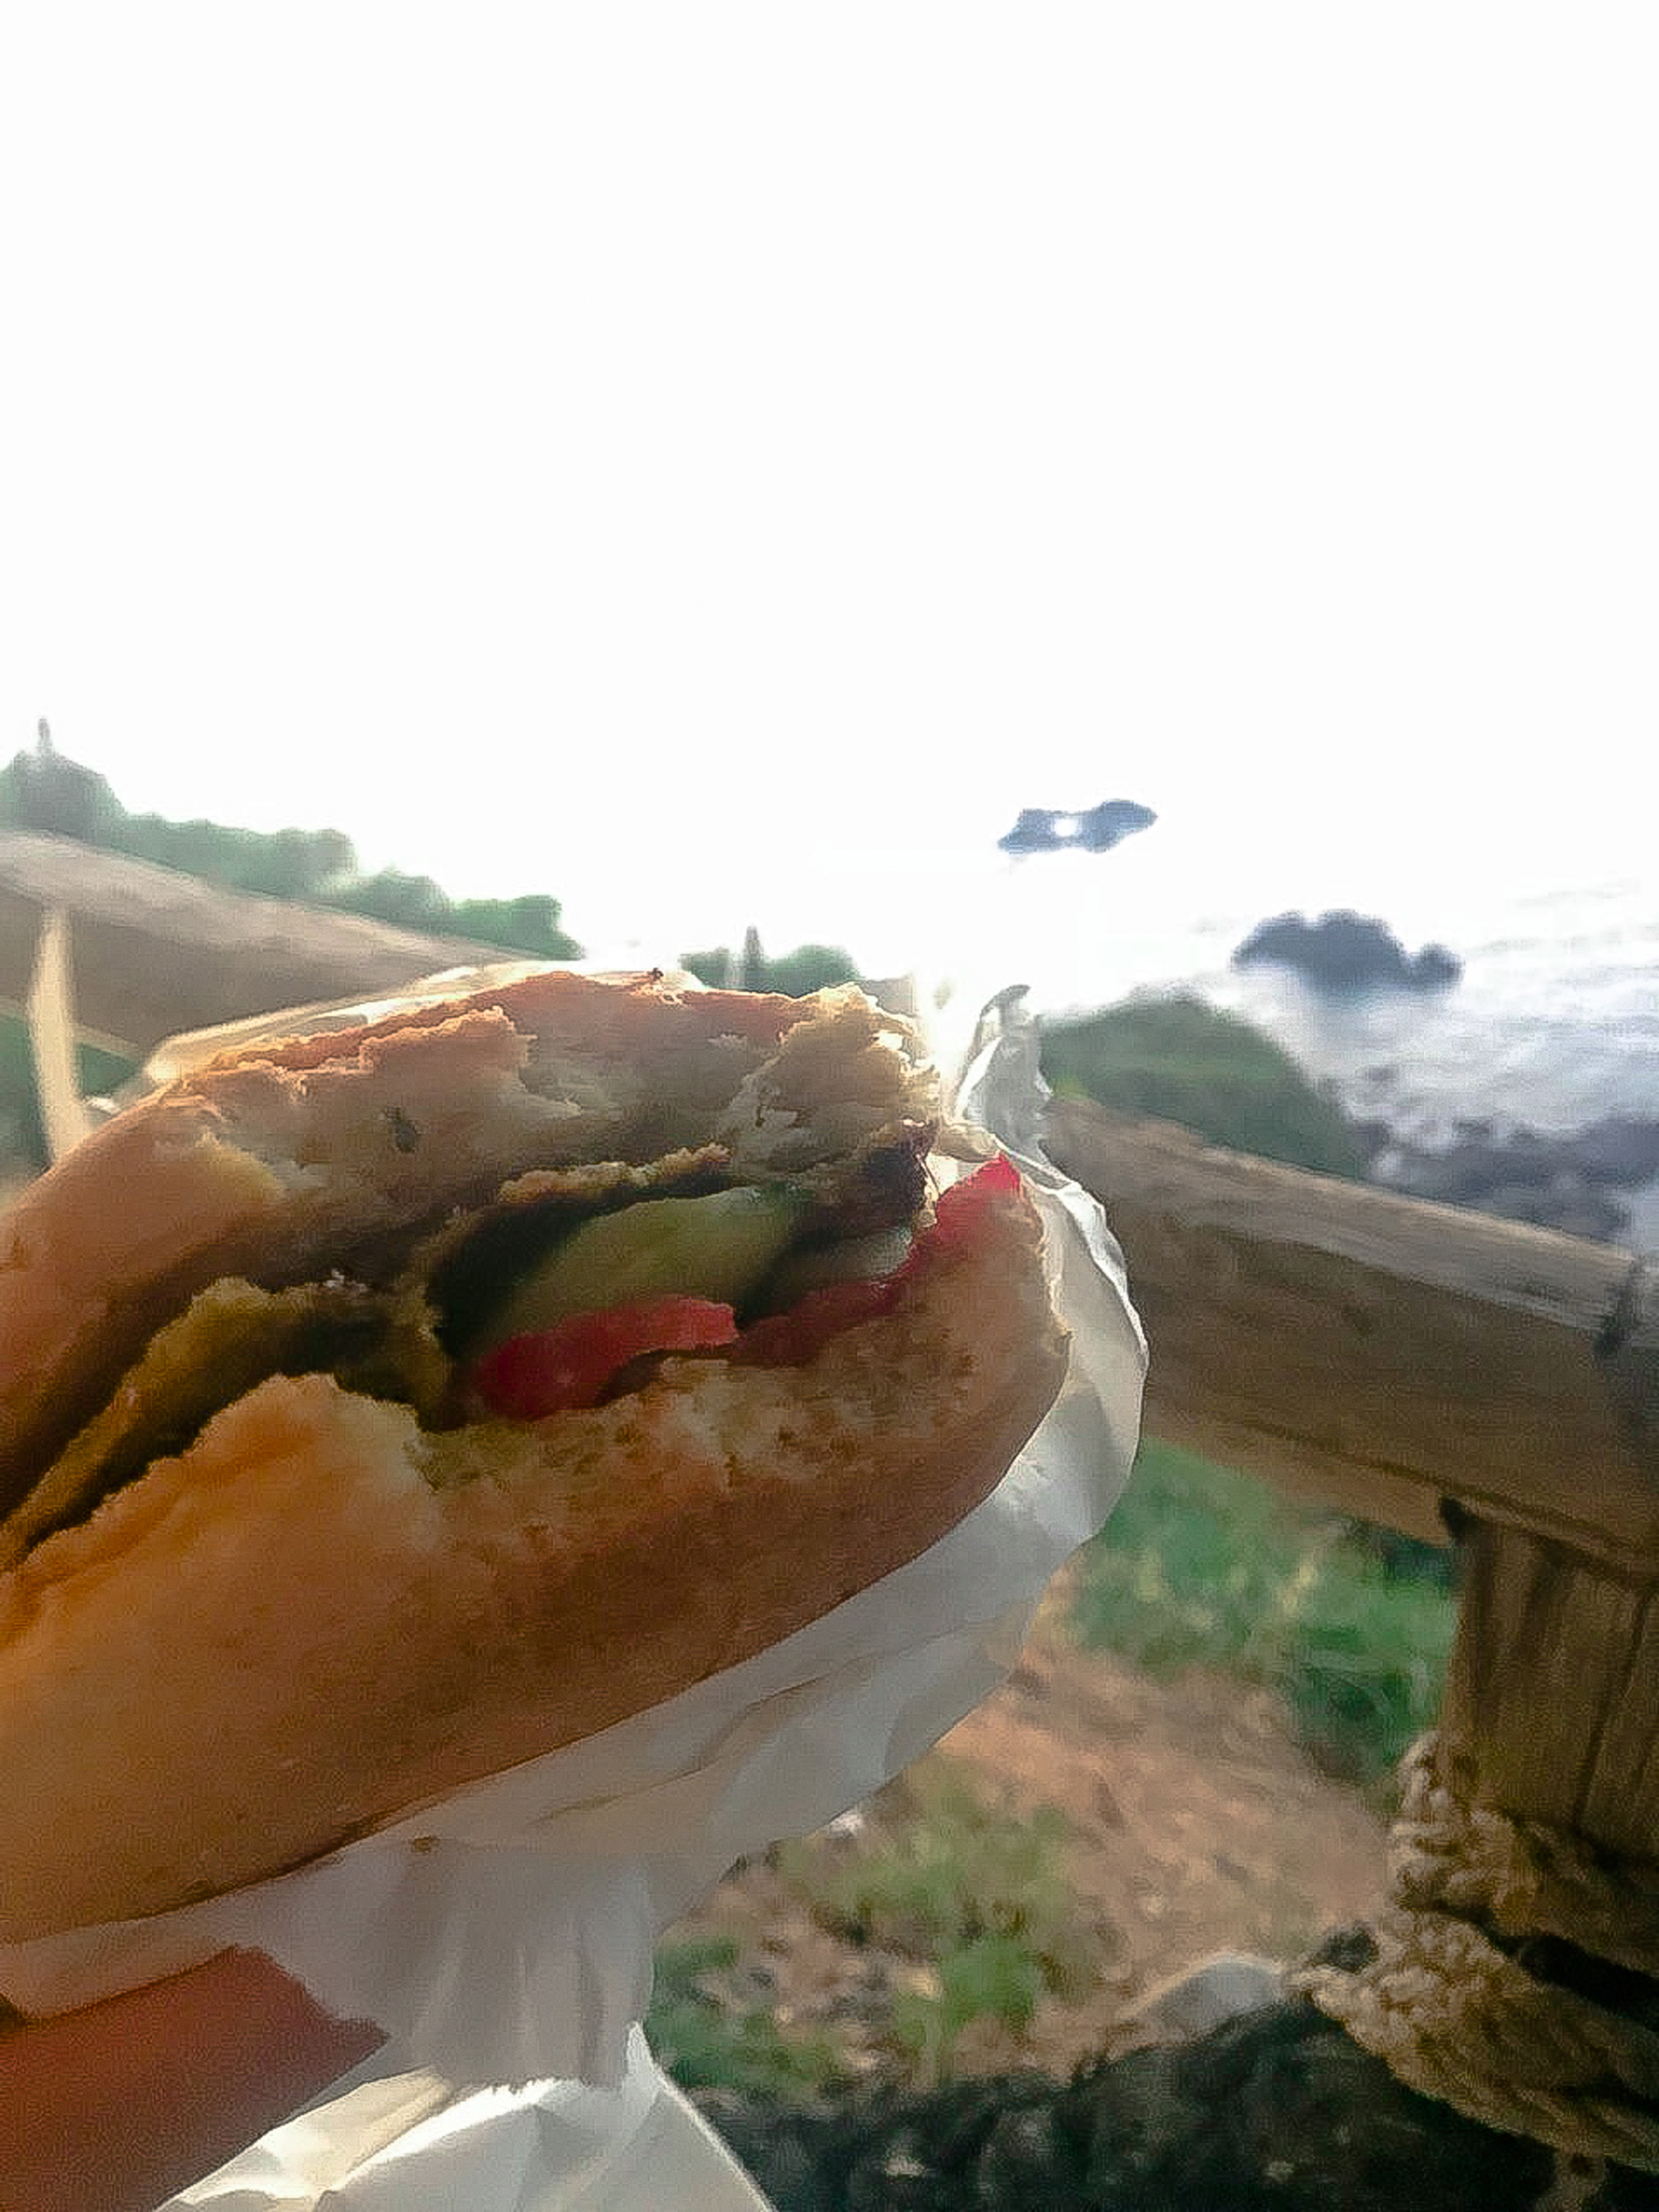 Koullas-sandwiches-food-truck-pomos-vegan-cyprus1